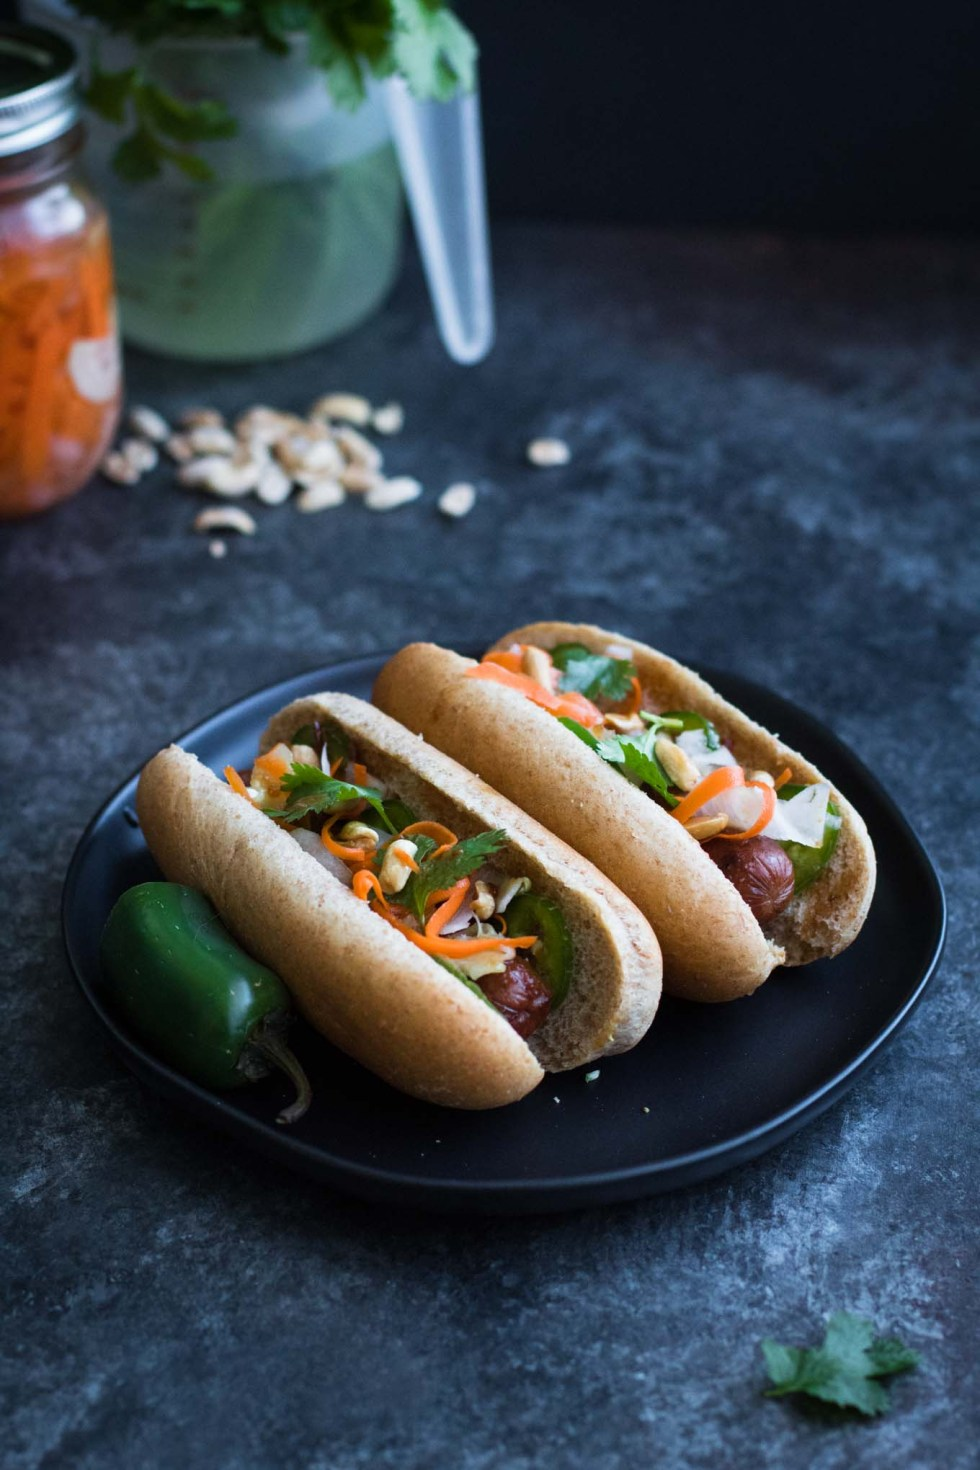 Bahn Mi Hot Dogs | Vietnamese Style | Pickled Daikon | Hoisin Sauce | Dinner